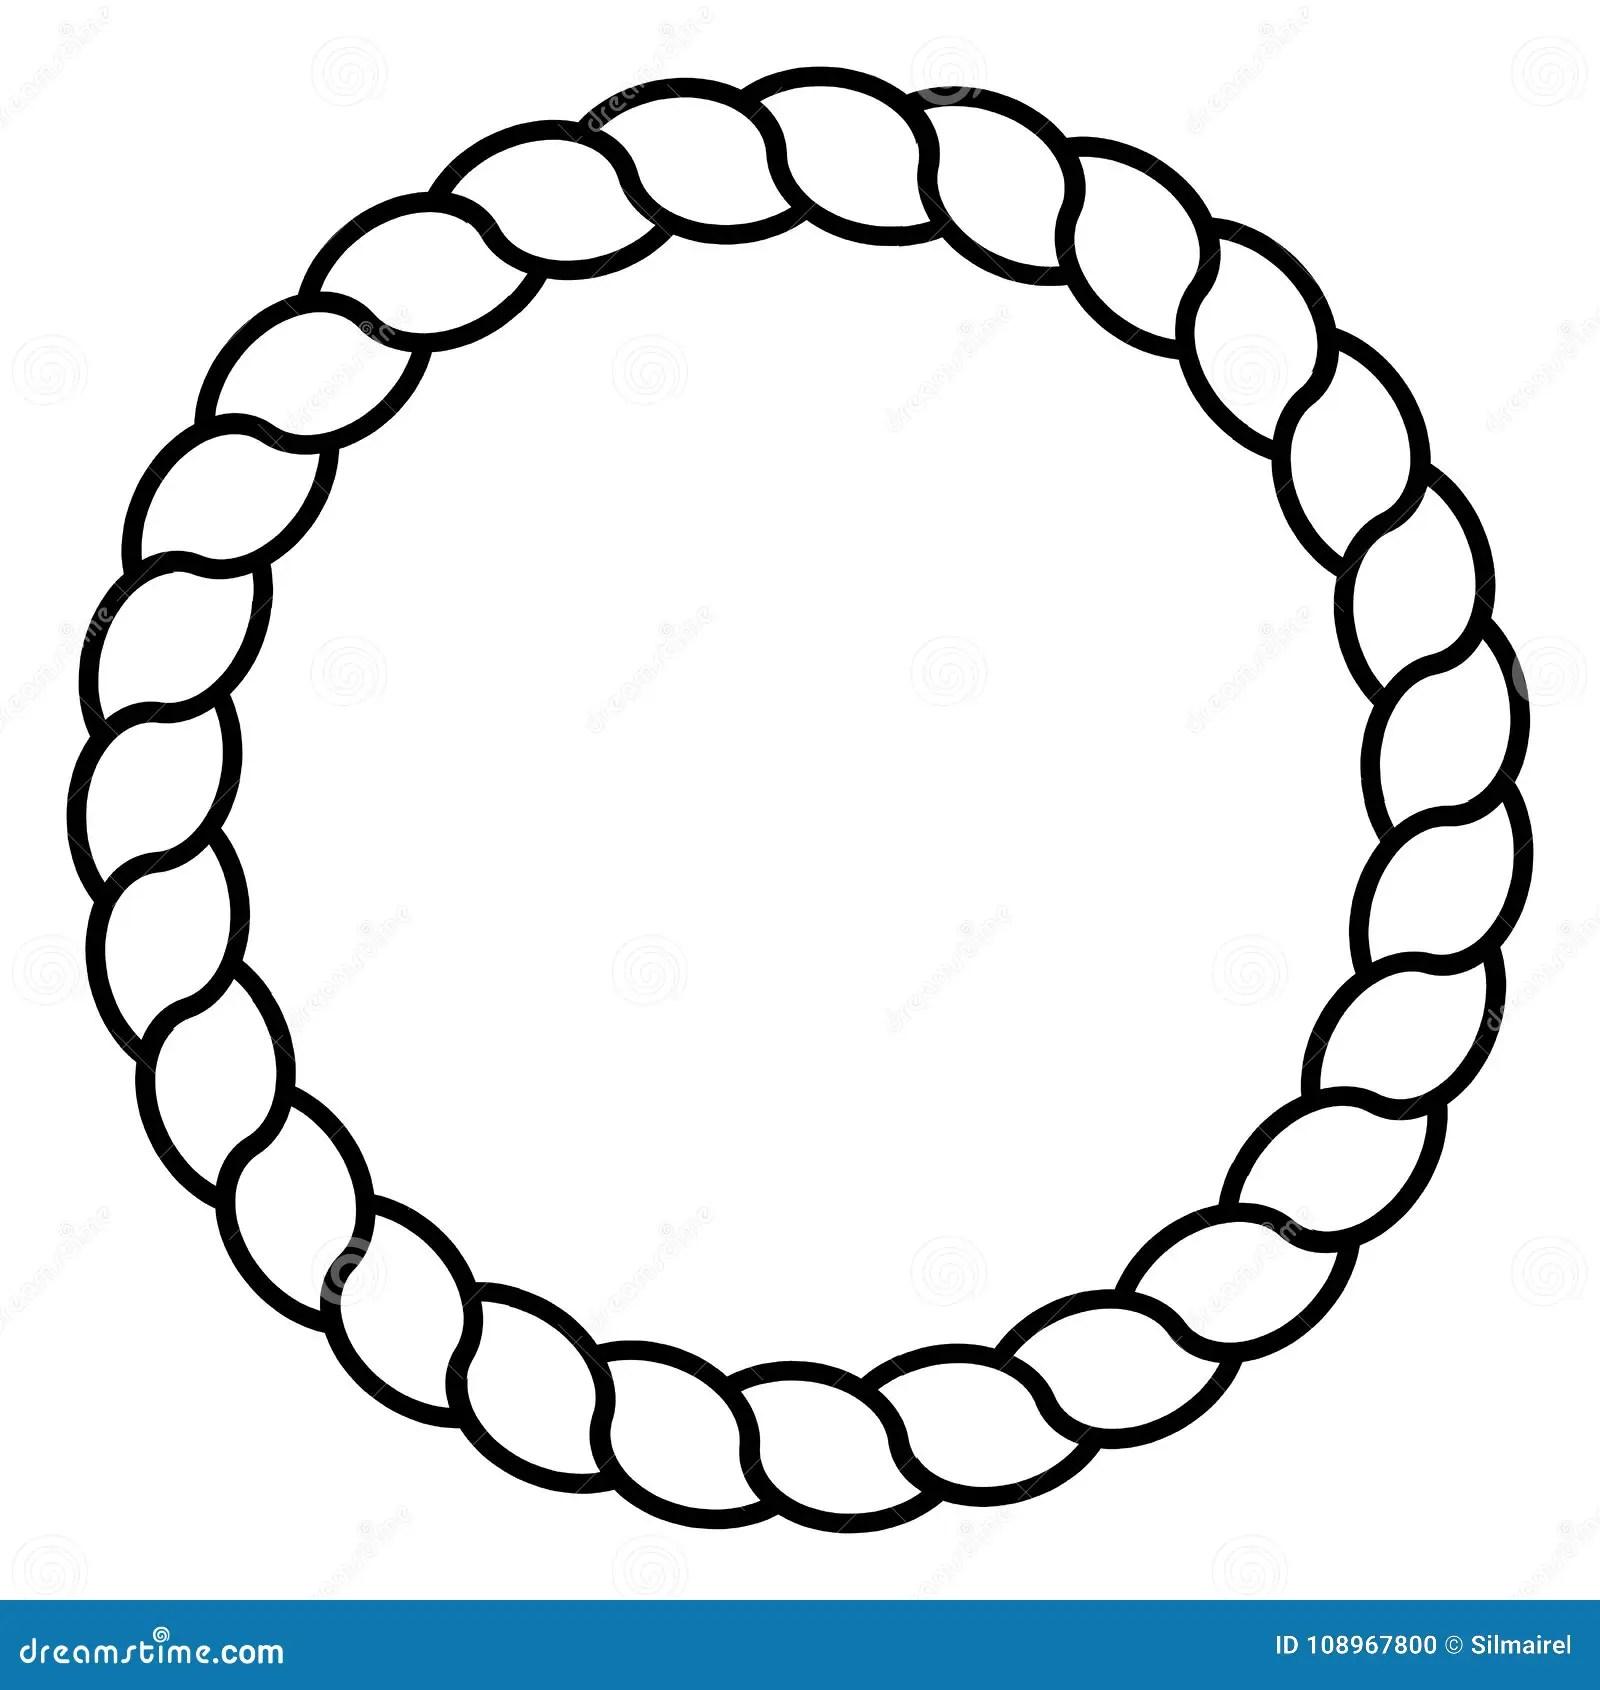 Monochrome Black And White Circle Rope Frame Line Art